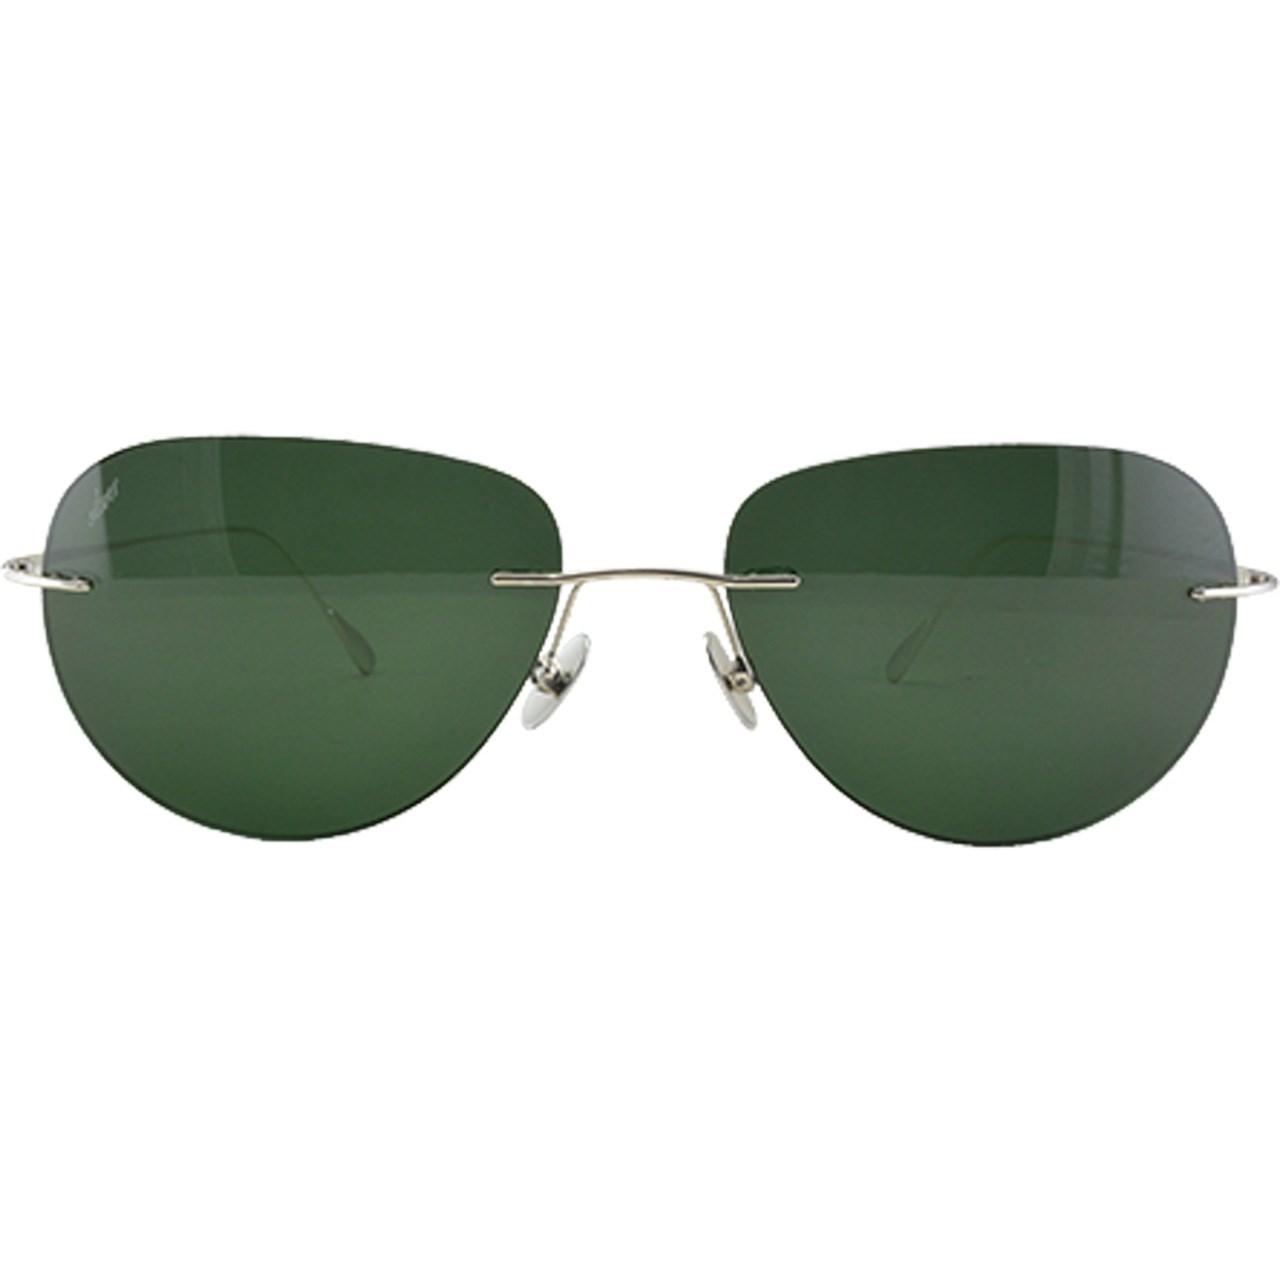 عینک آفتابی Nik03 سری نقره مدل Nk3301 Rsp